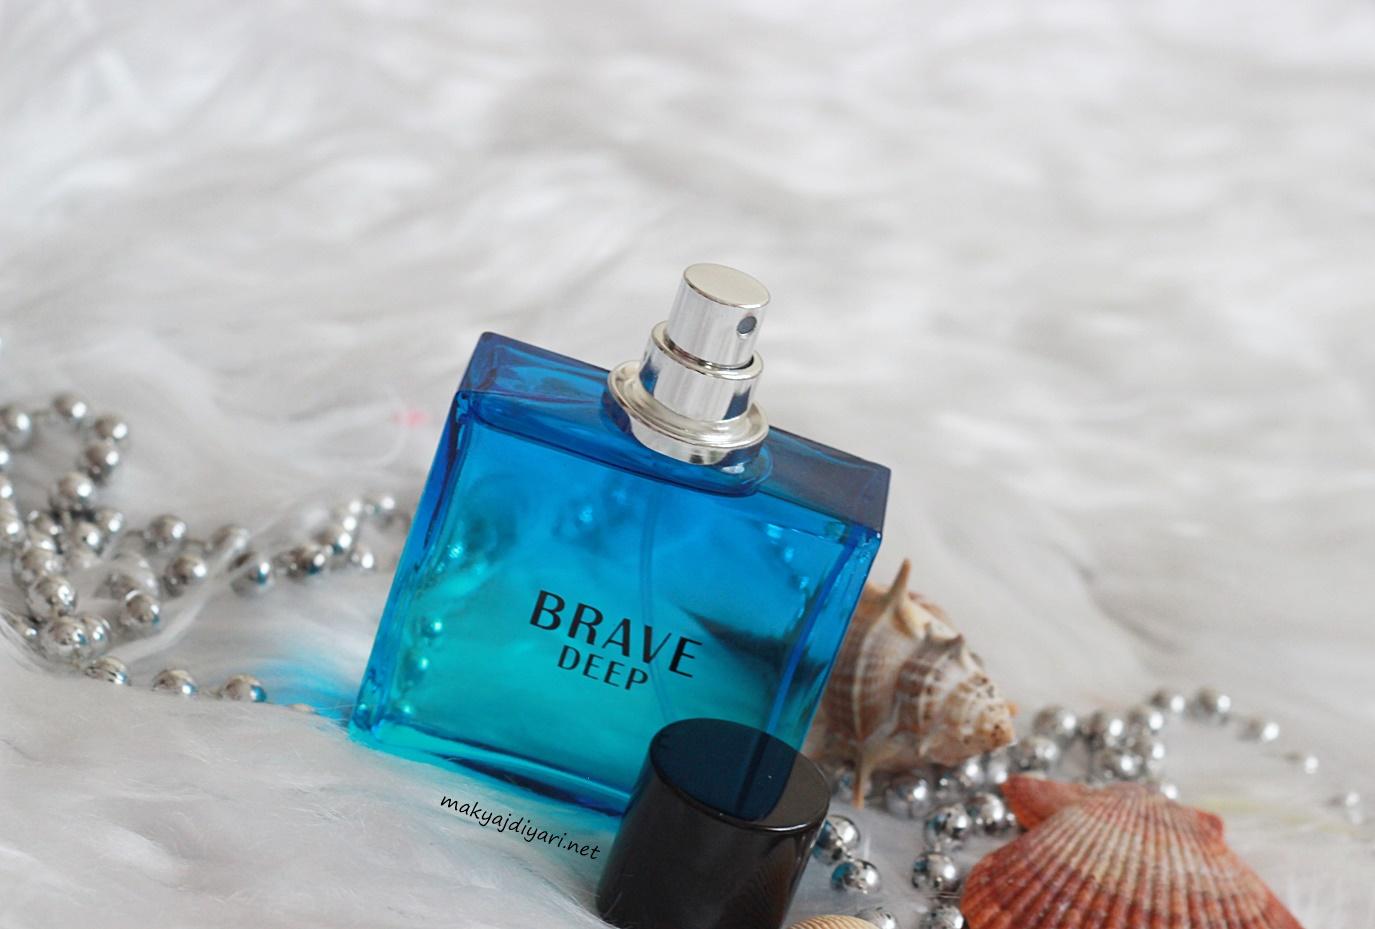 farmasi-brave-deep-parfum